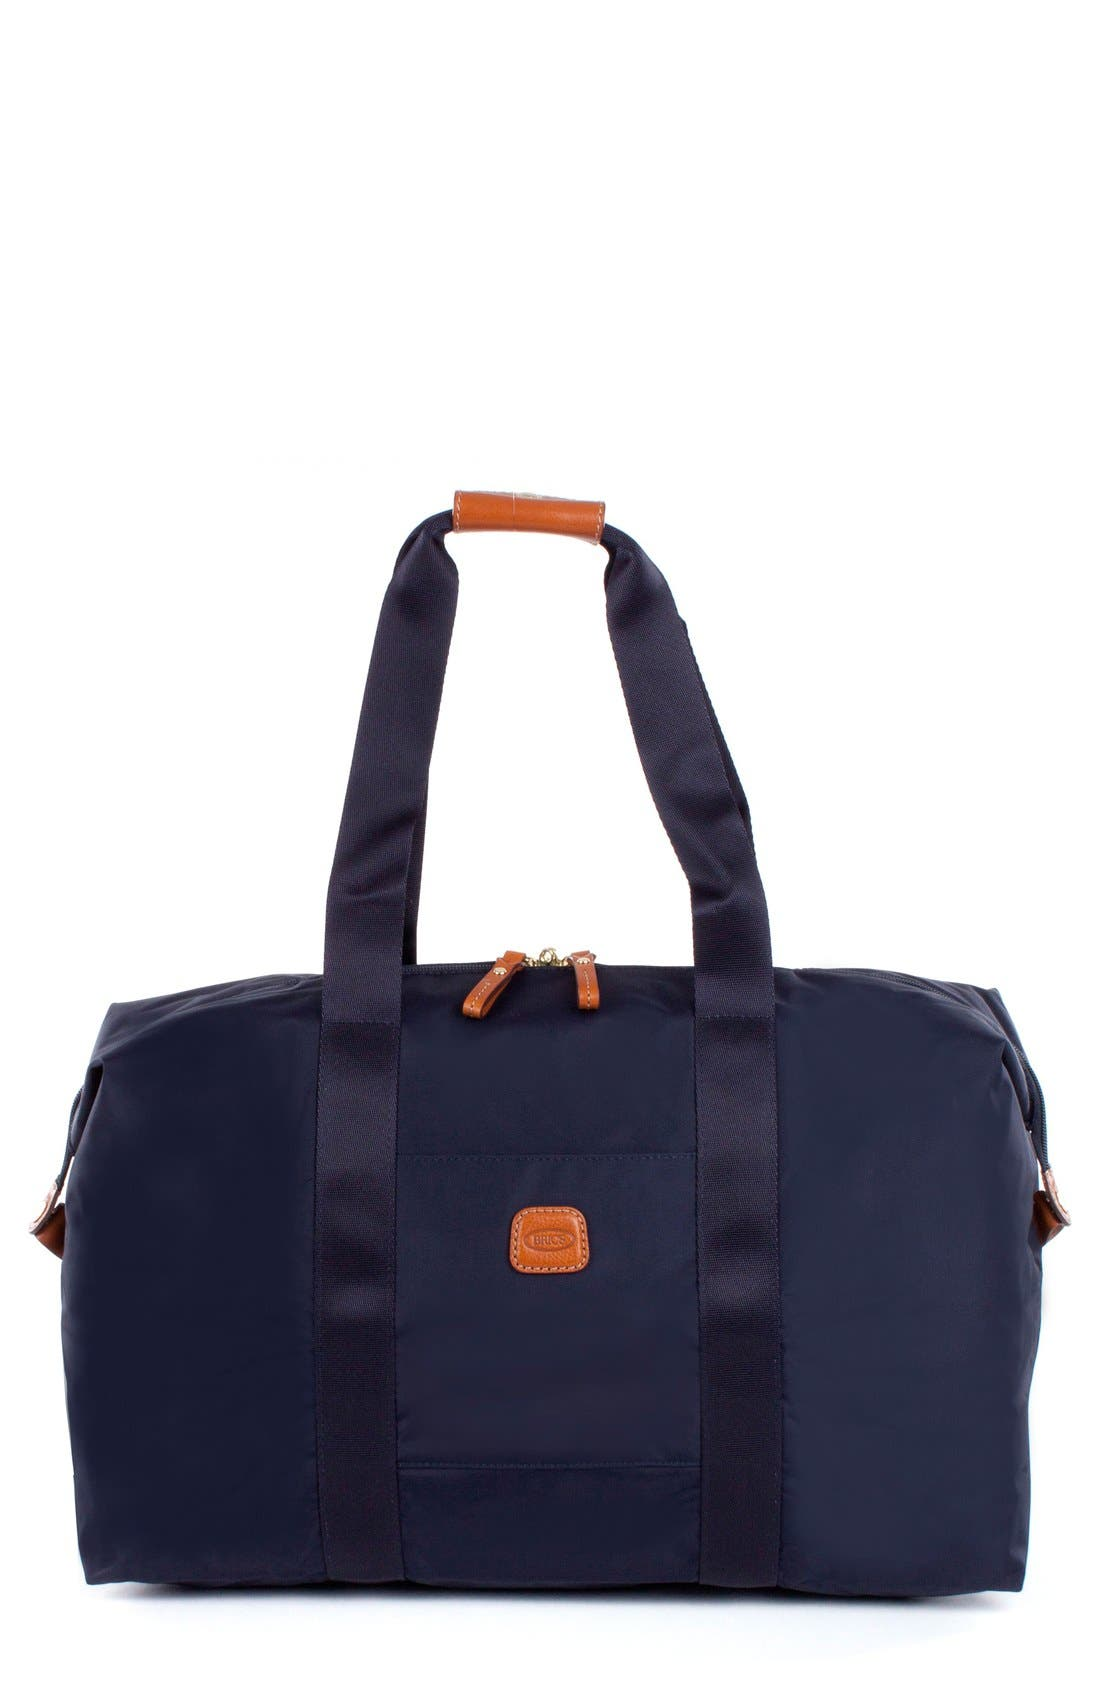 Main Image - Bric's 'X-Bag' Folding Duffel Bag (18 Inch)